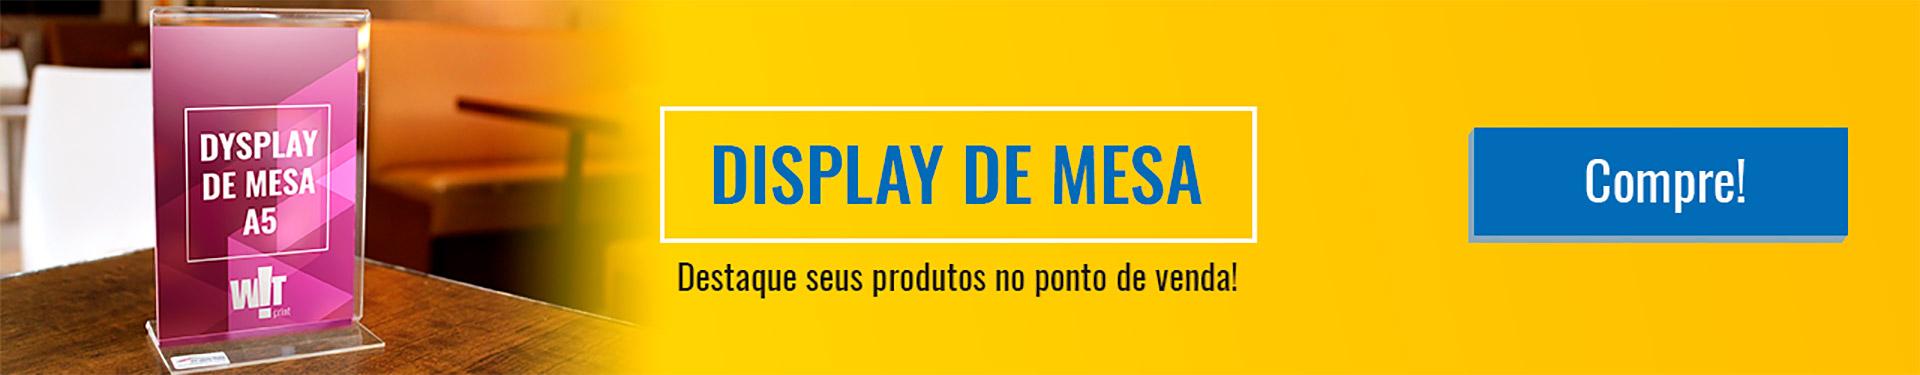 Wit Print Comércio Eletronico e Distribuidora Ltda